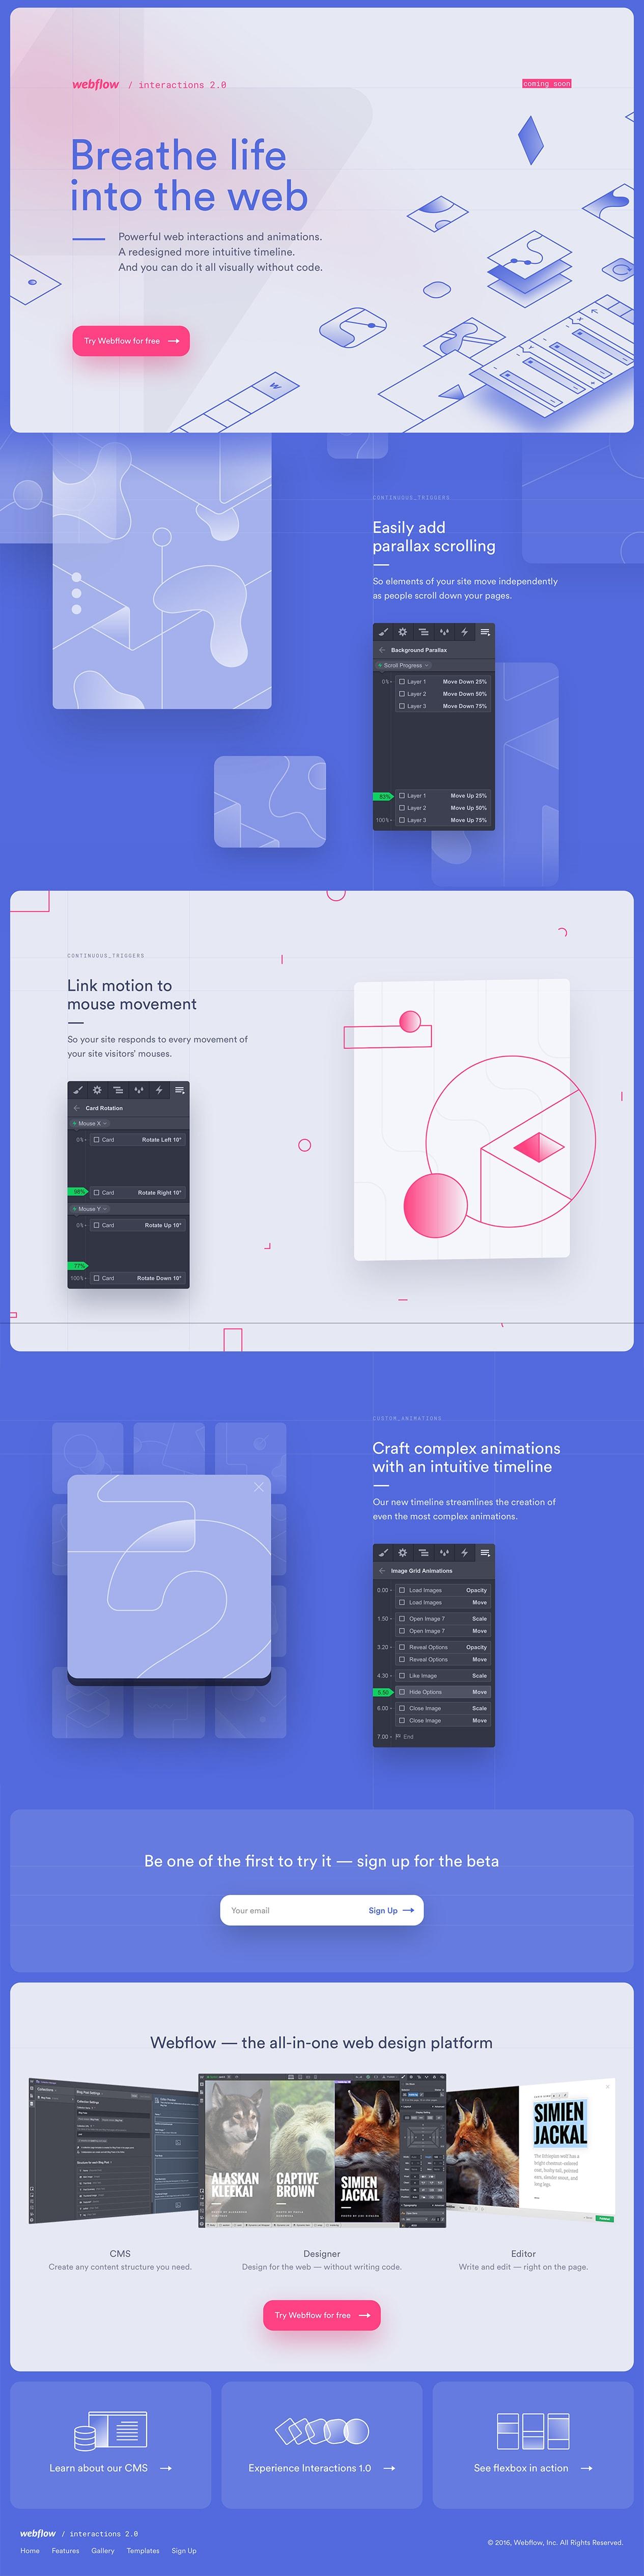 Webflow Interactions 2 0 landing page design inspiration - Lapa Ninja